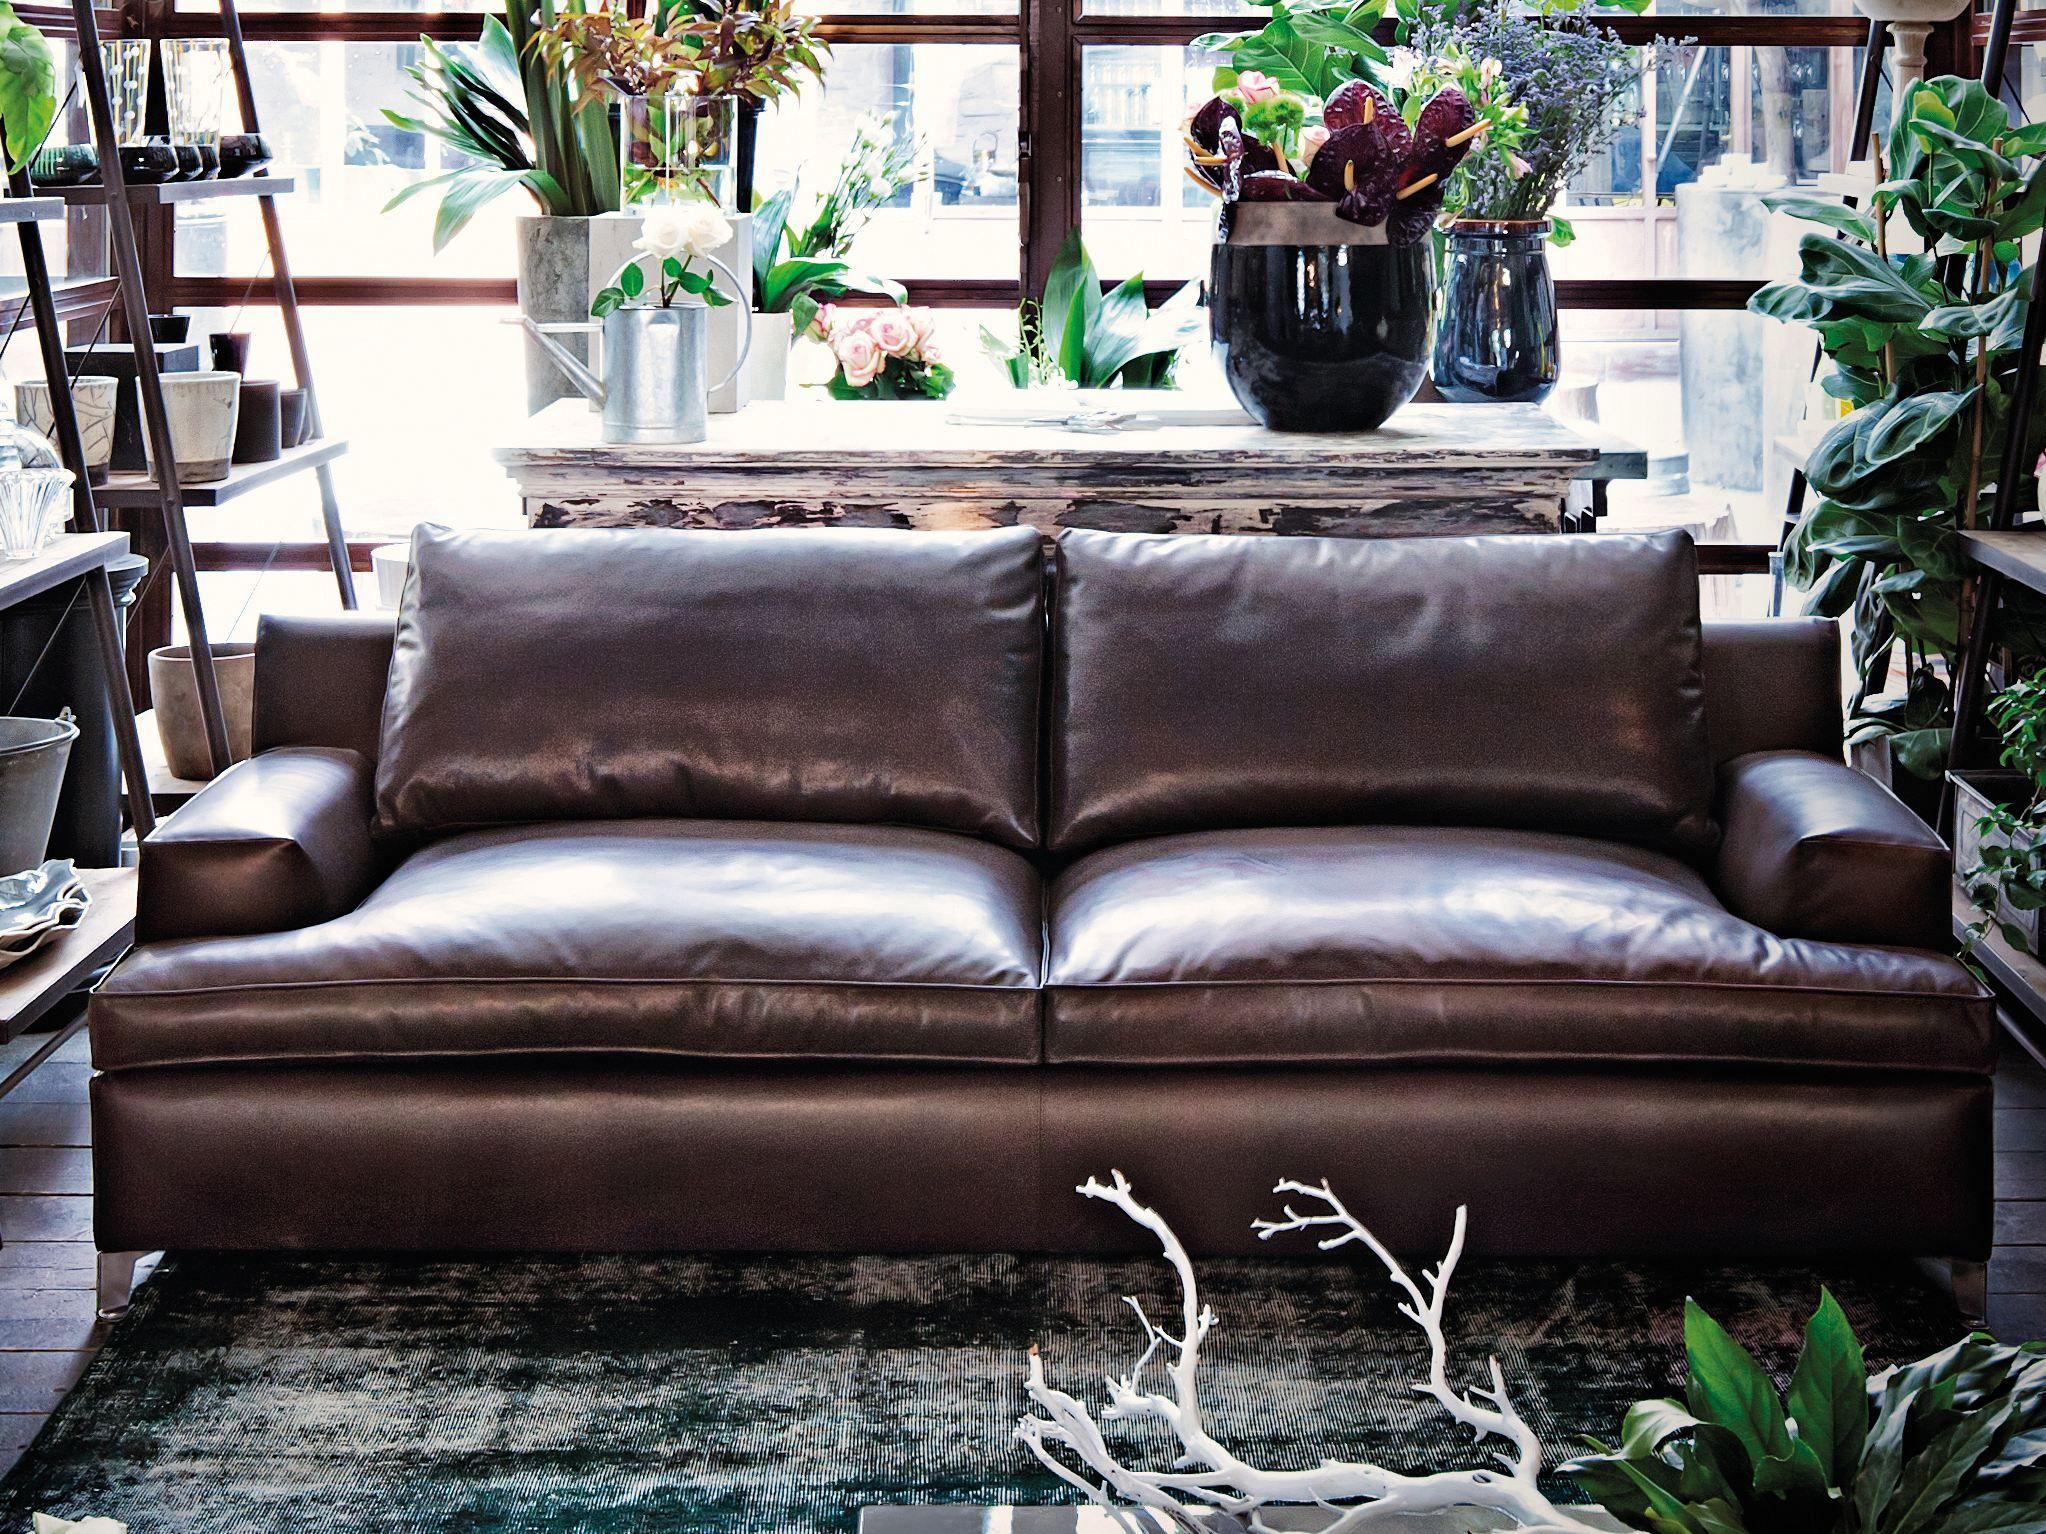 LOFT | Leather Sofa Loft Collection By Arketipo Design Adriano Piazzesi